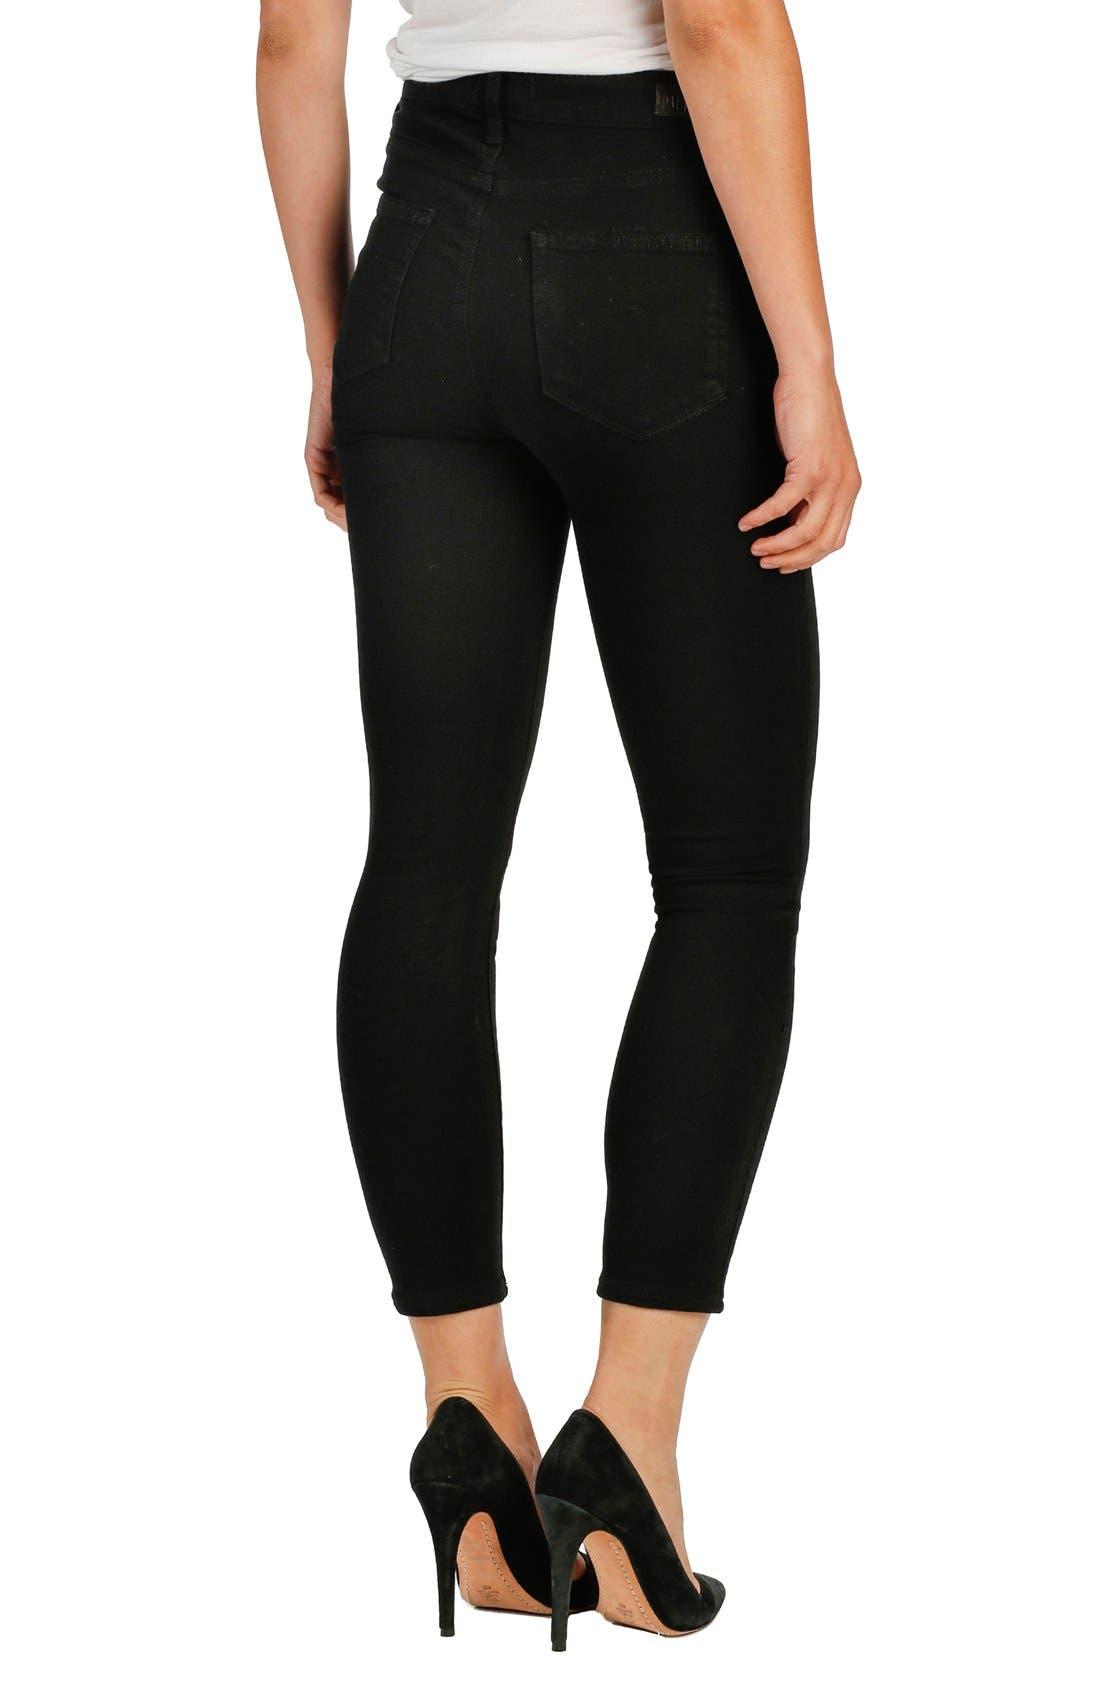 Transcend - Margot High Waist Crop Ultra Skinny Jeans,                             Alternate thumbnail 2, color,                             Black Shadow